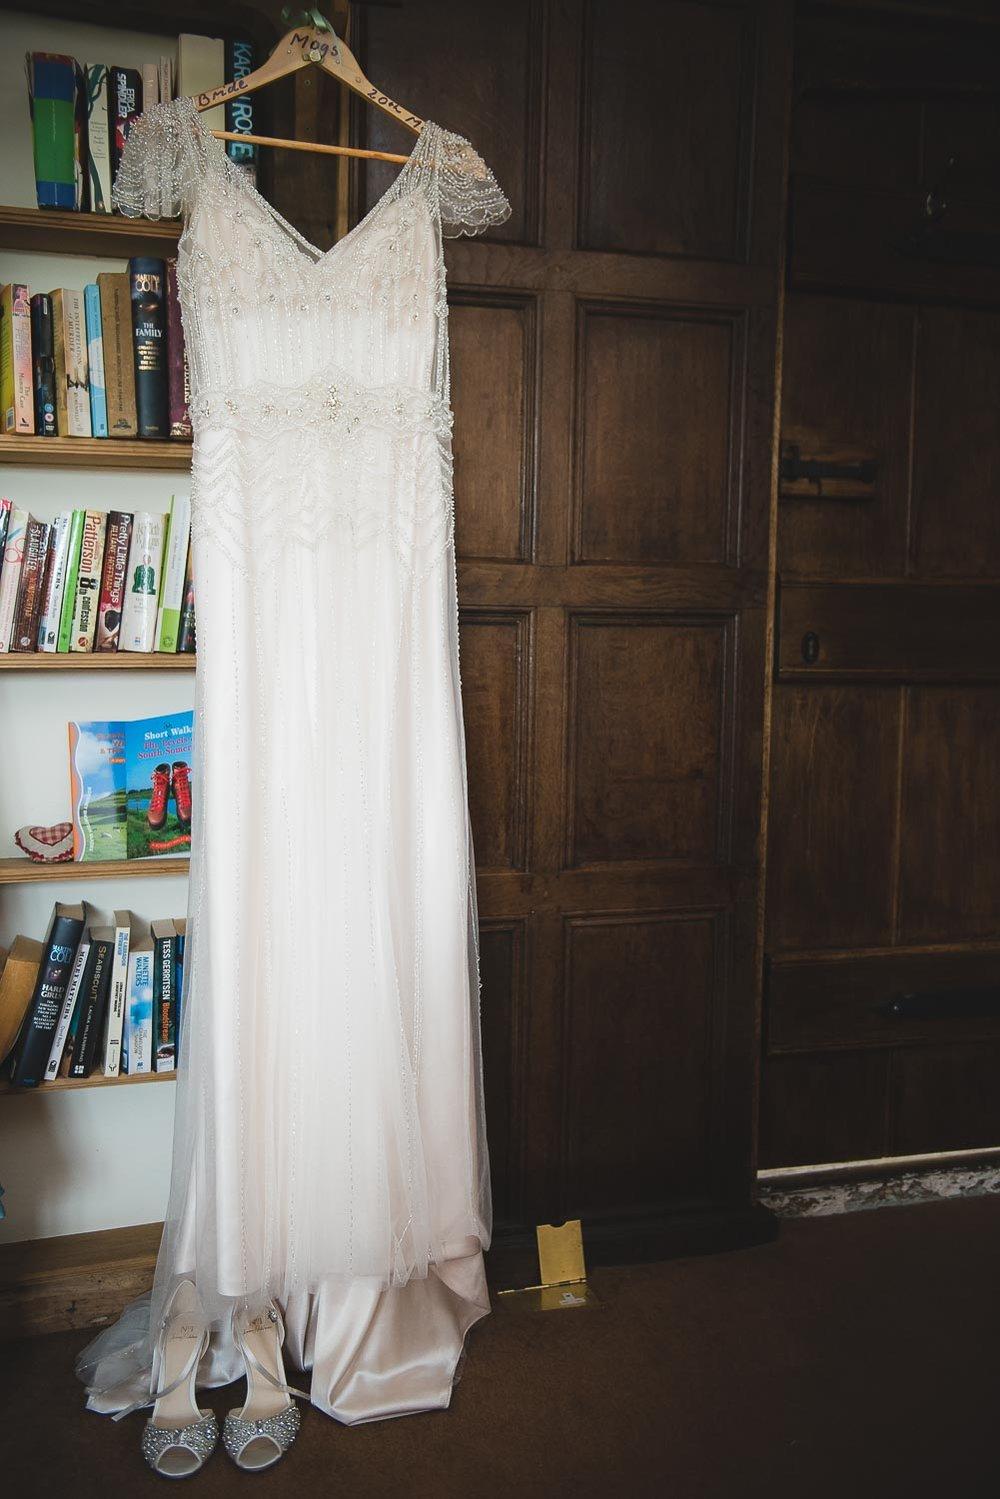 reportage-wedding-photographer-bristol-9.jpg